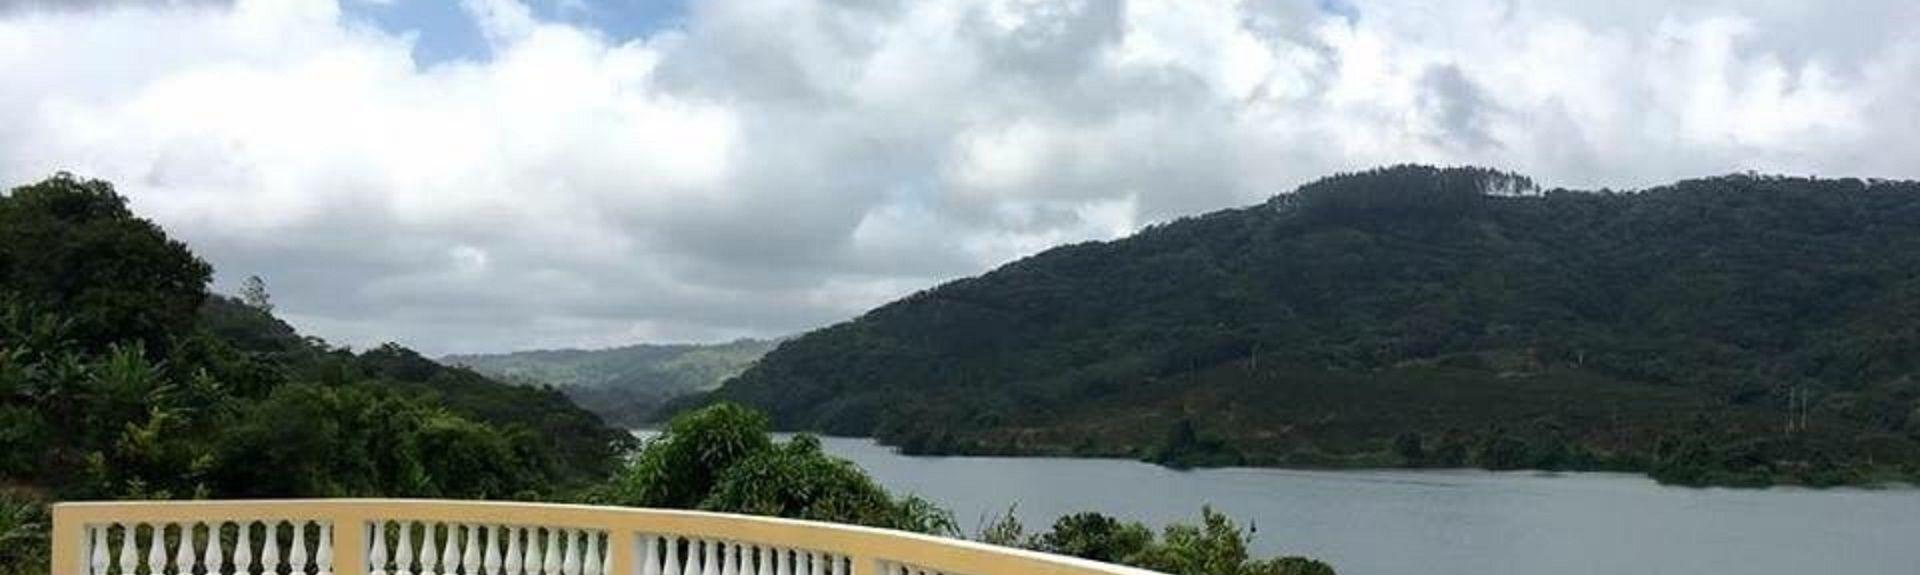 Sabana Grande, Porto Rico